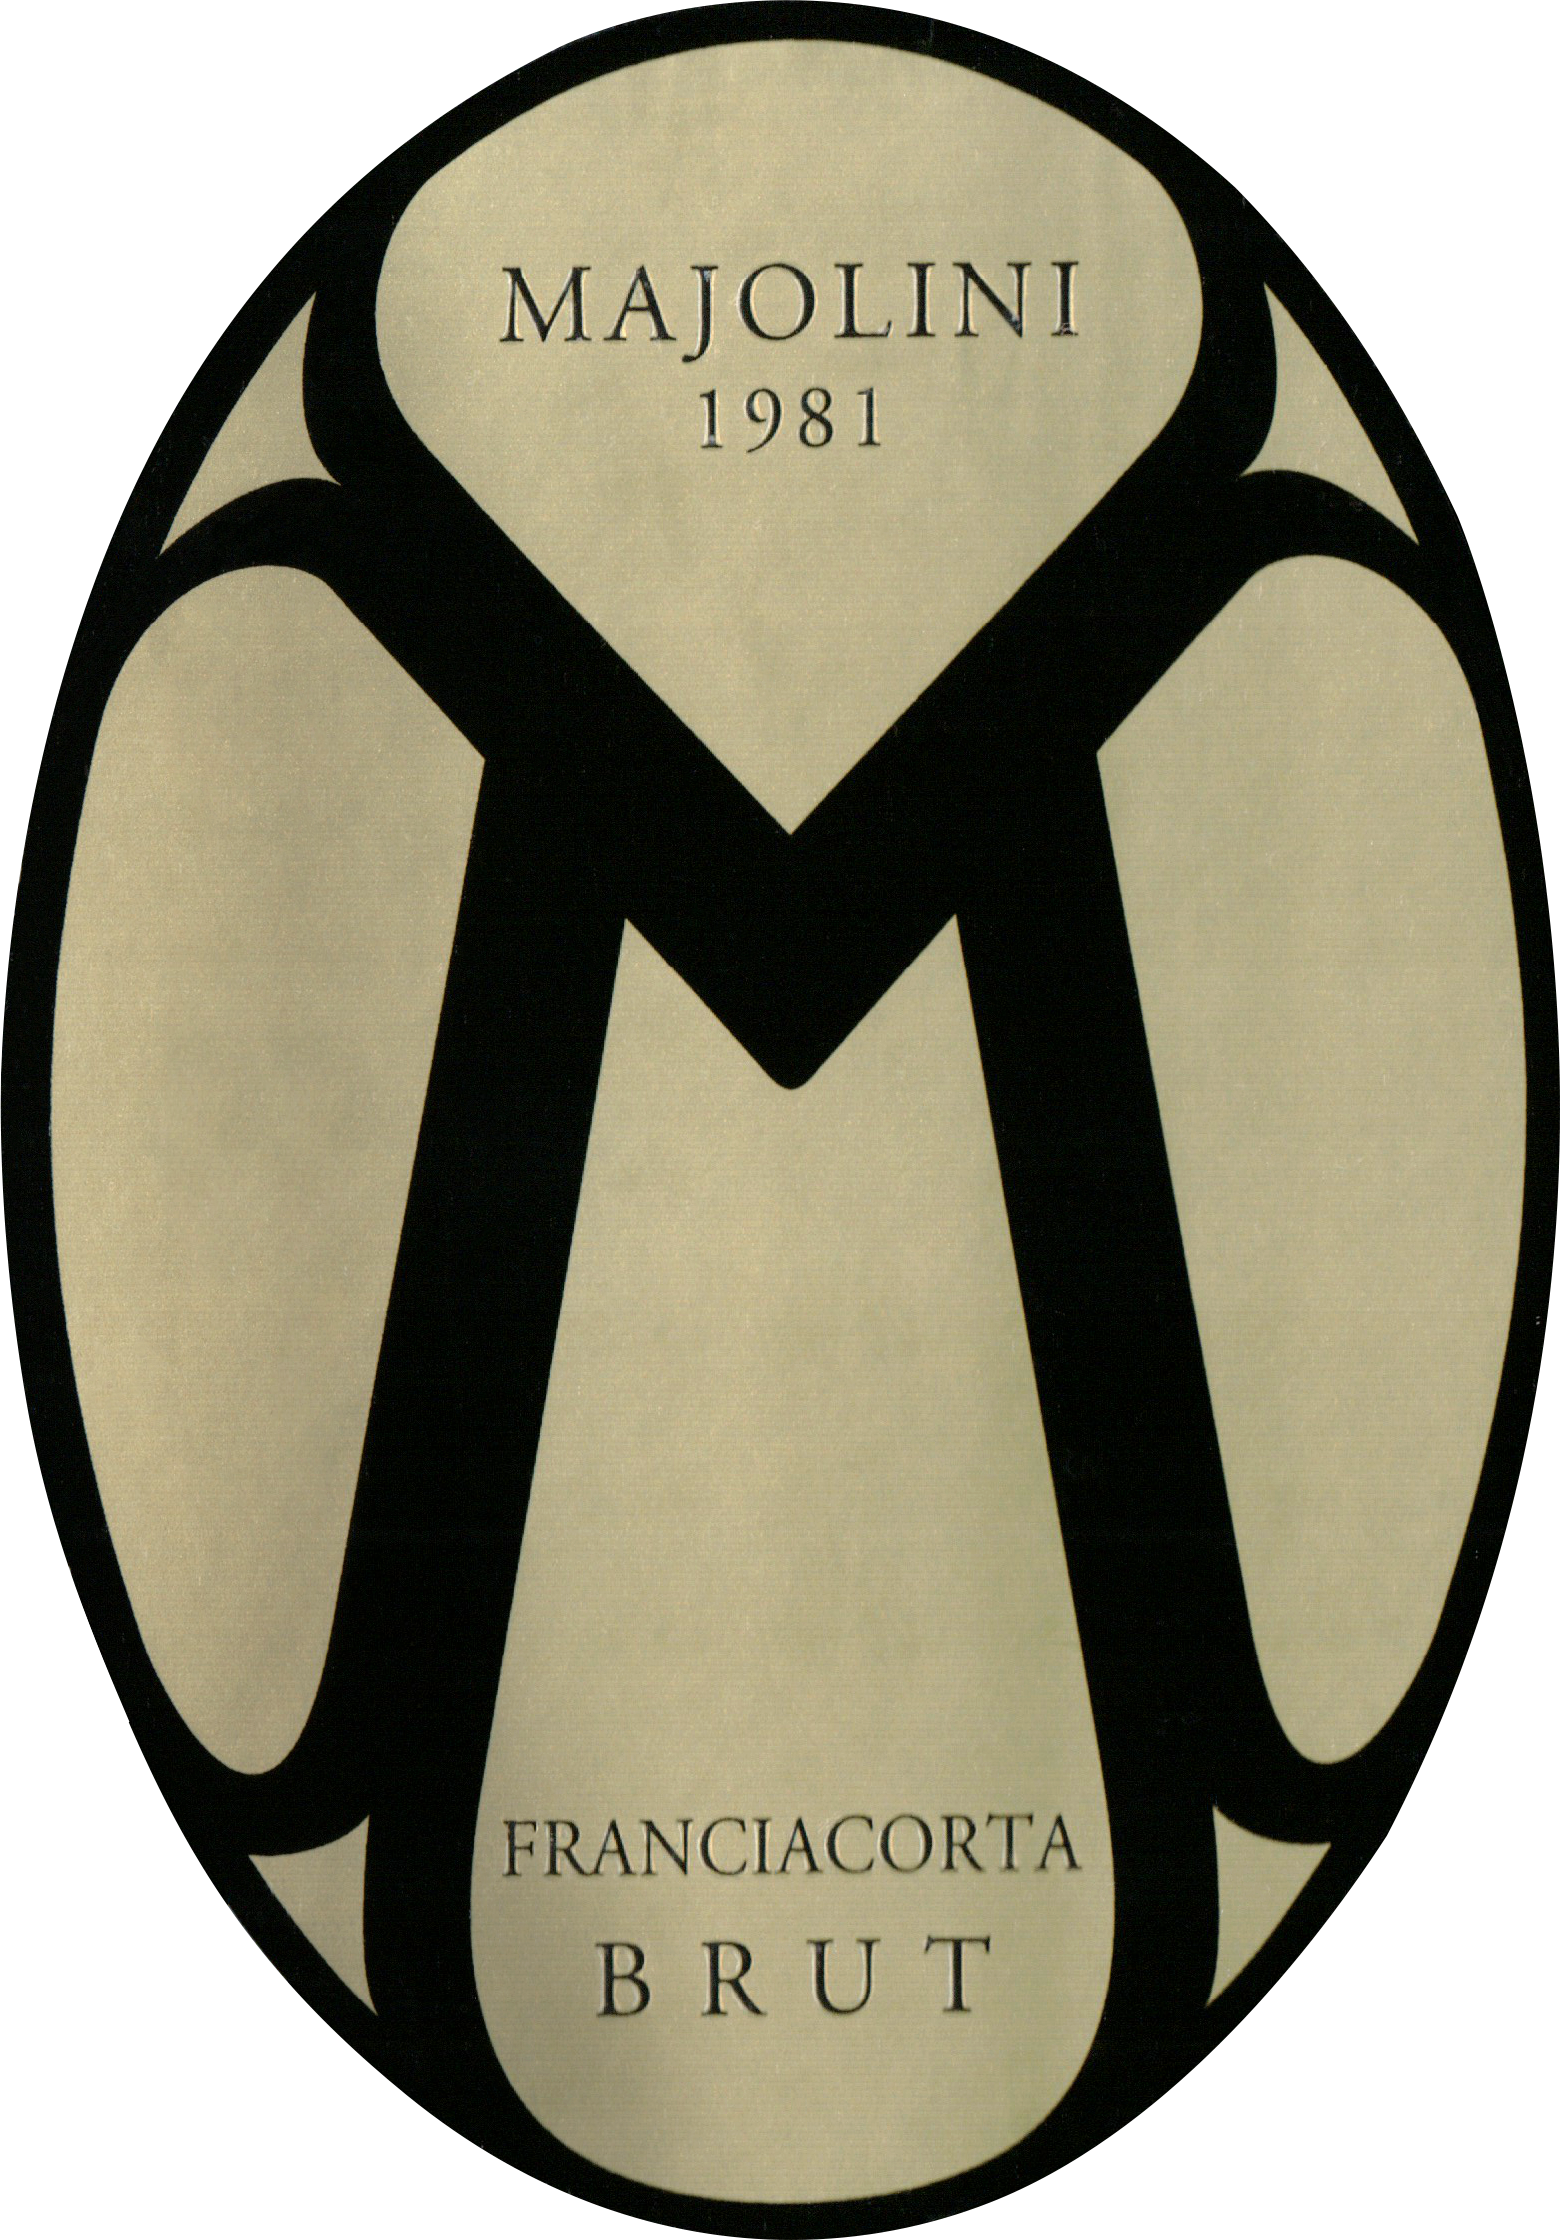 Majolini Franciacorta Brut 2016